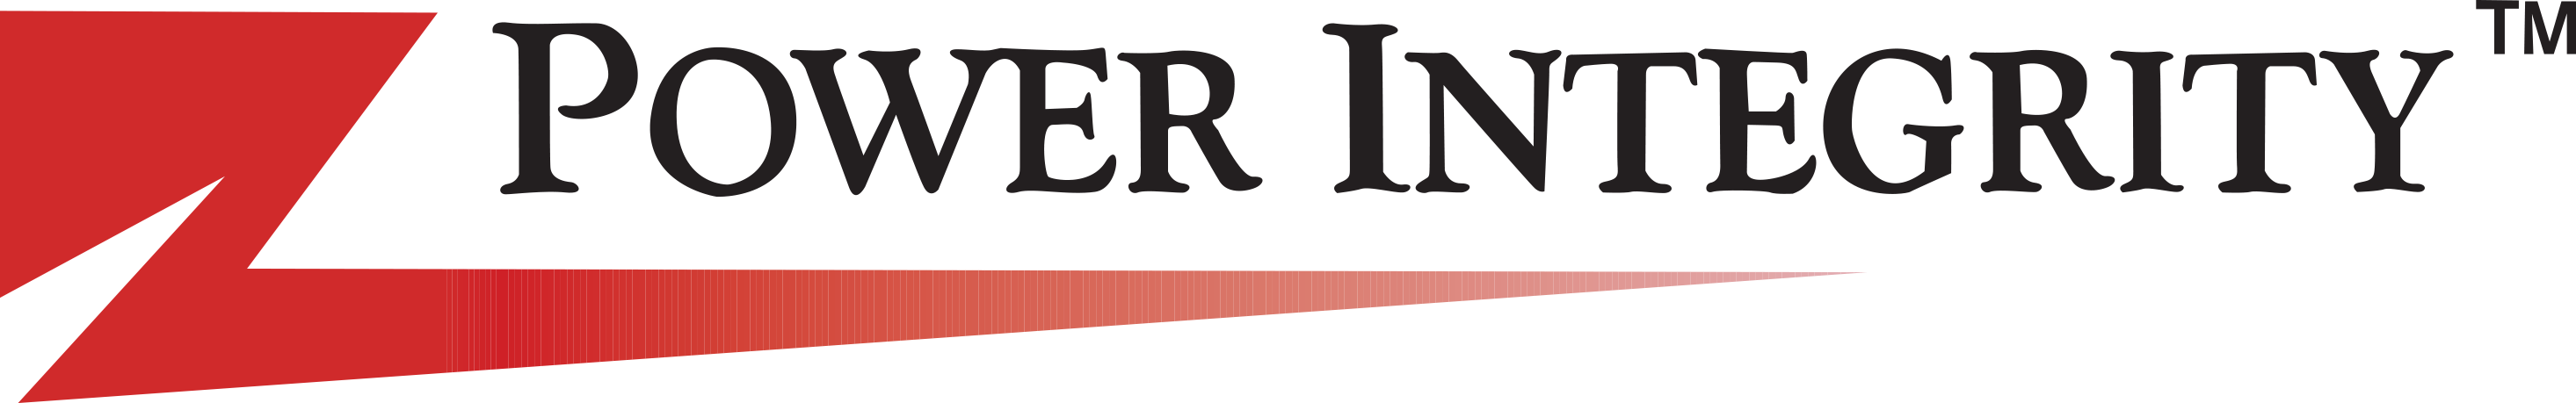 Power Integrity Corporation